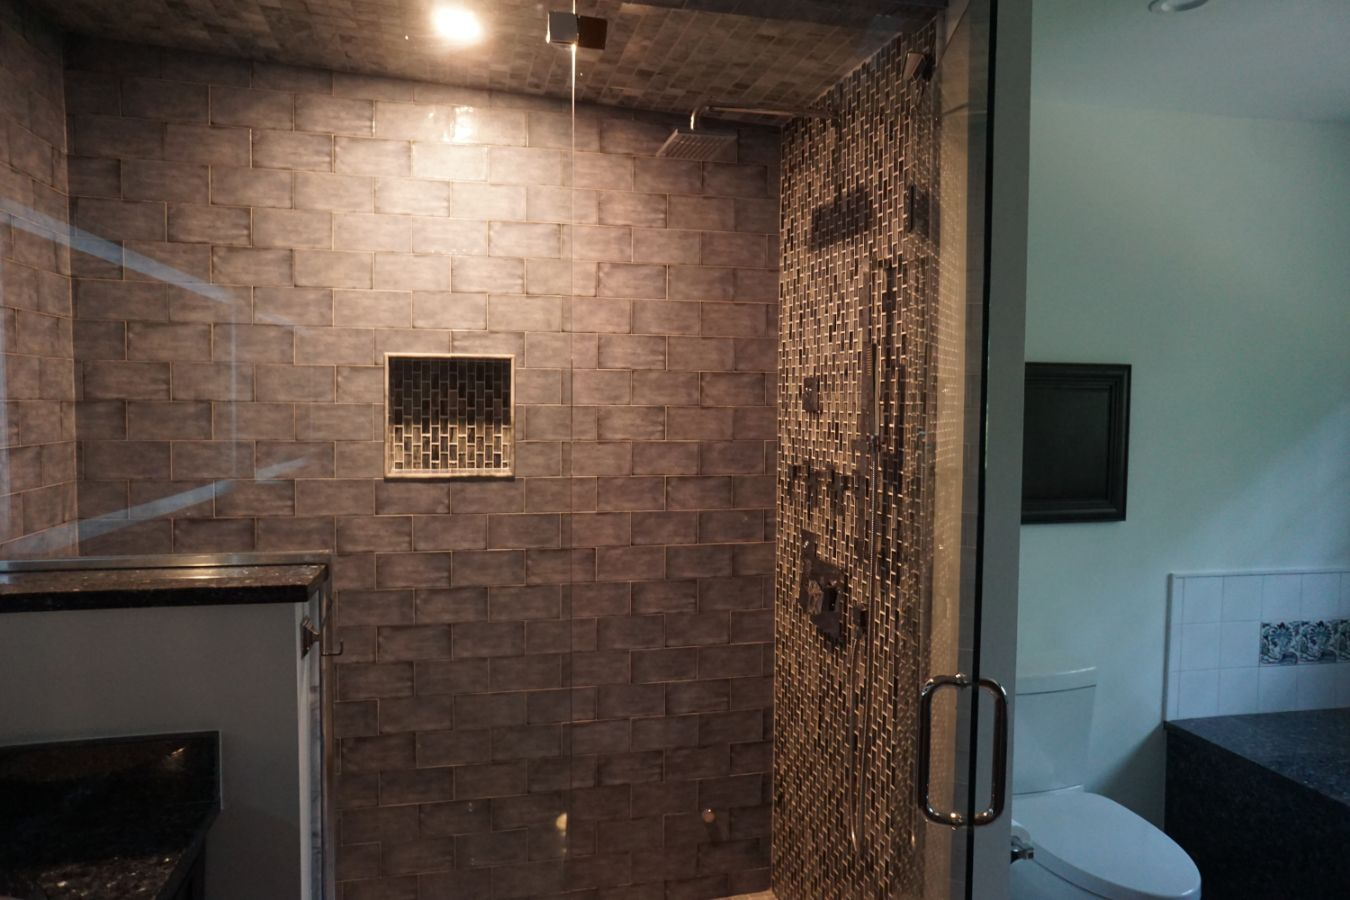 Bathroom Remodel Steam Shower Arlington Heights IL